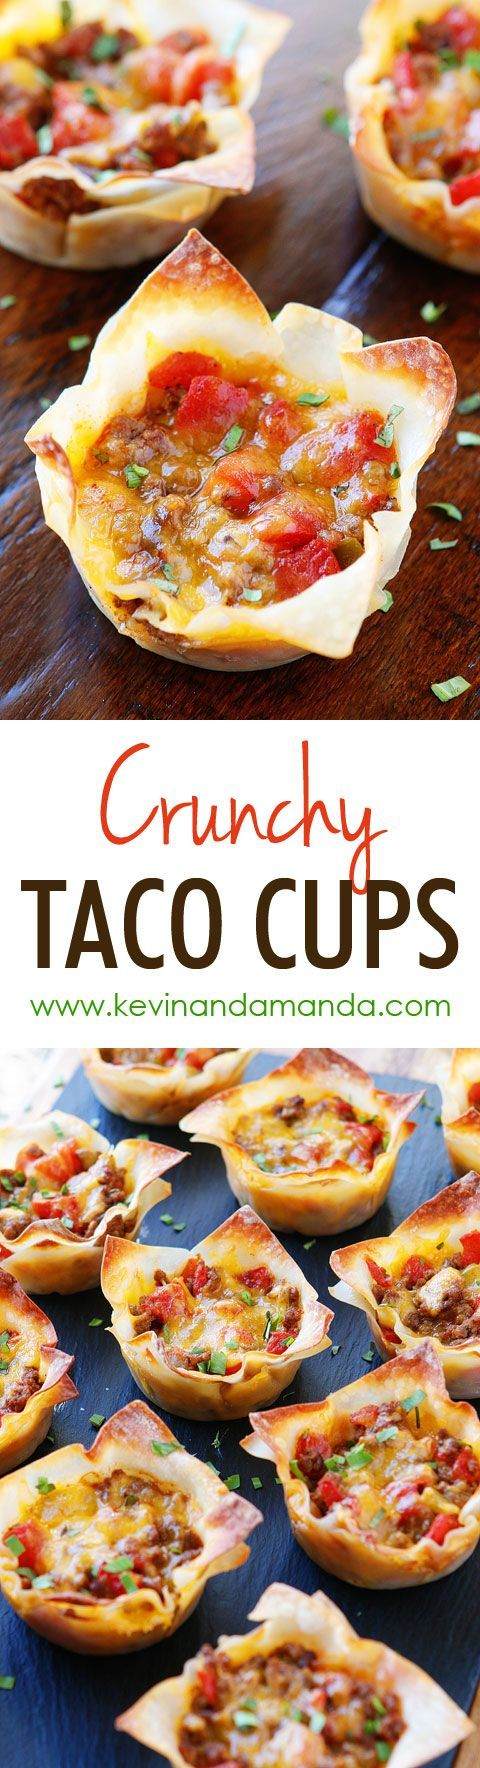 Crunchy Taco Cups